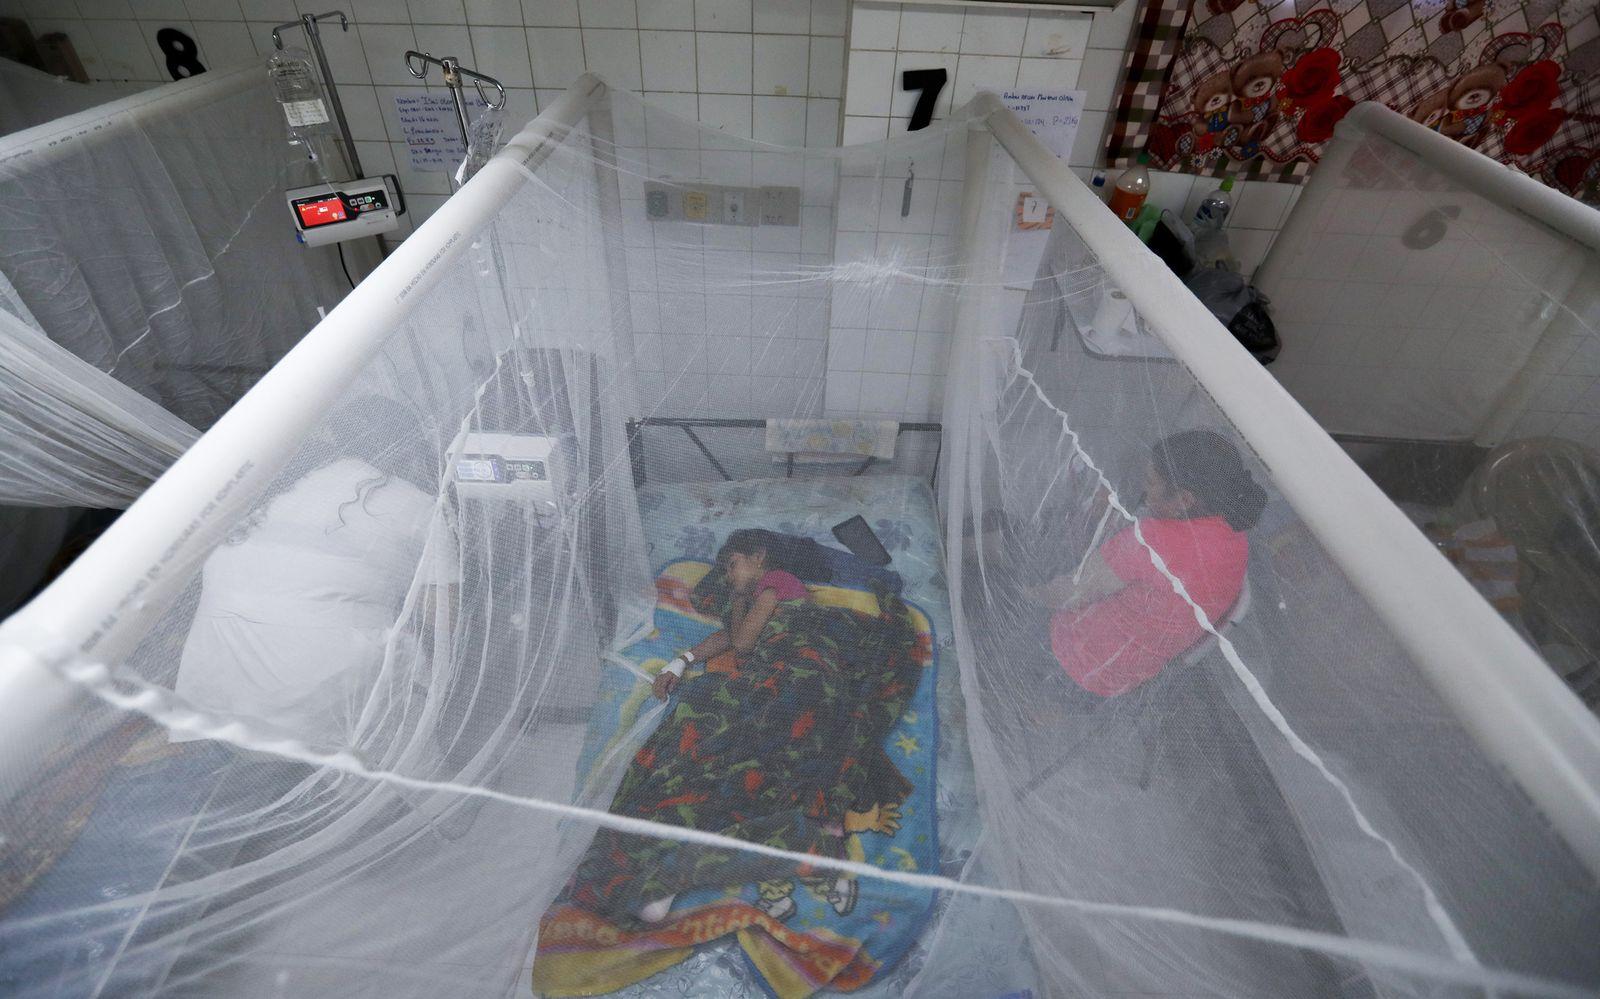 Dengue-Fieber in Mittelamerika